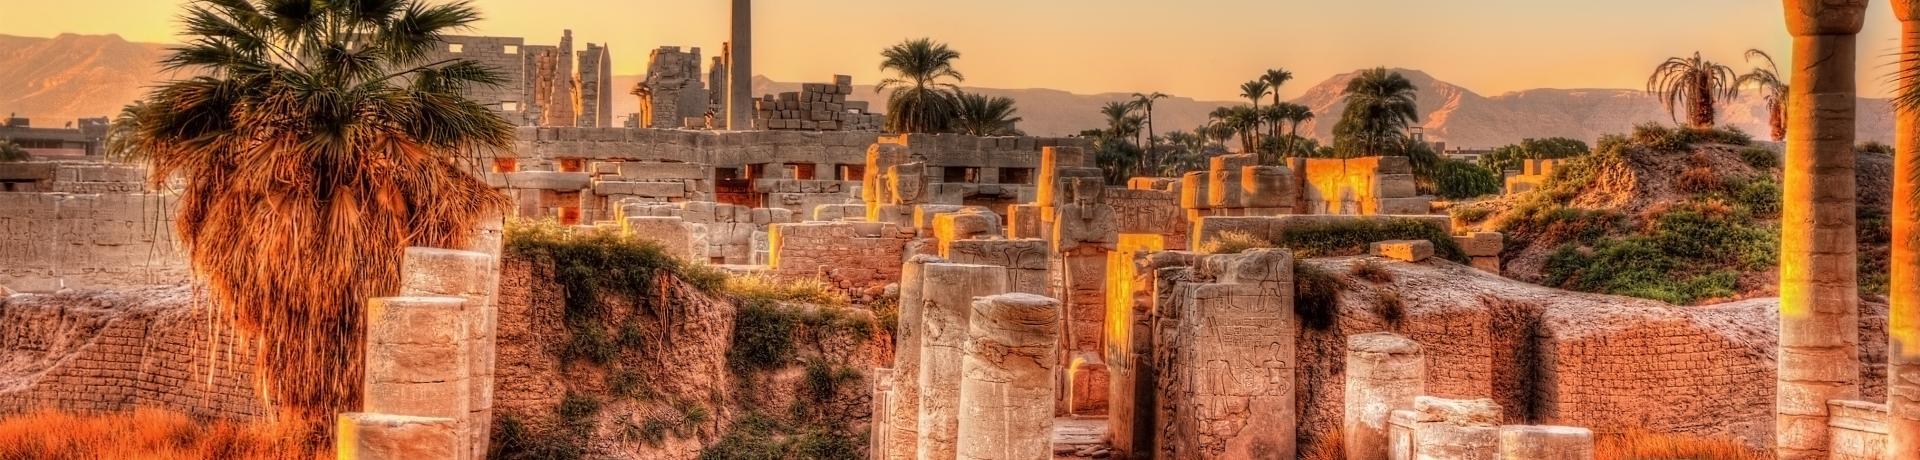 3676+Ägypten+Luxor+Karnak-Tempel+GI-465985662.jpg